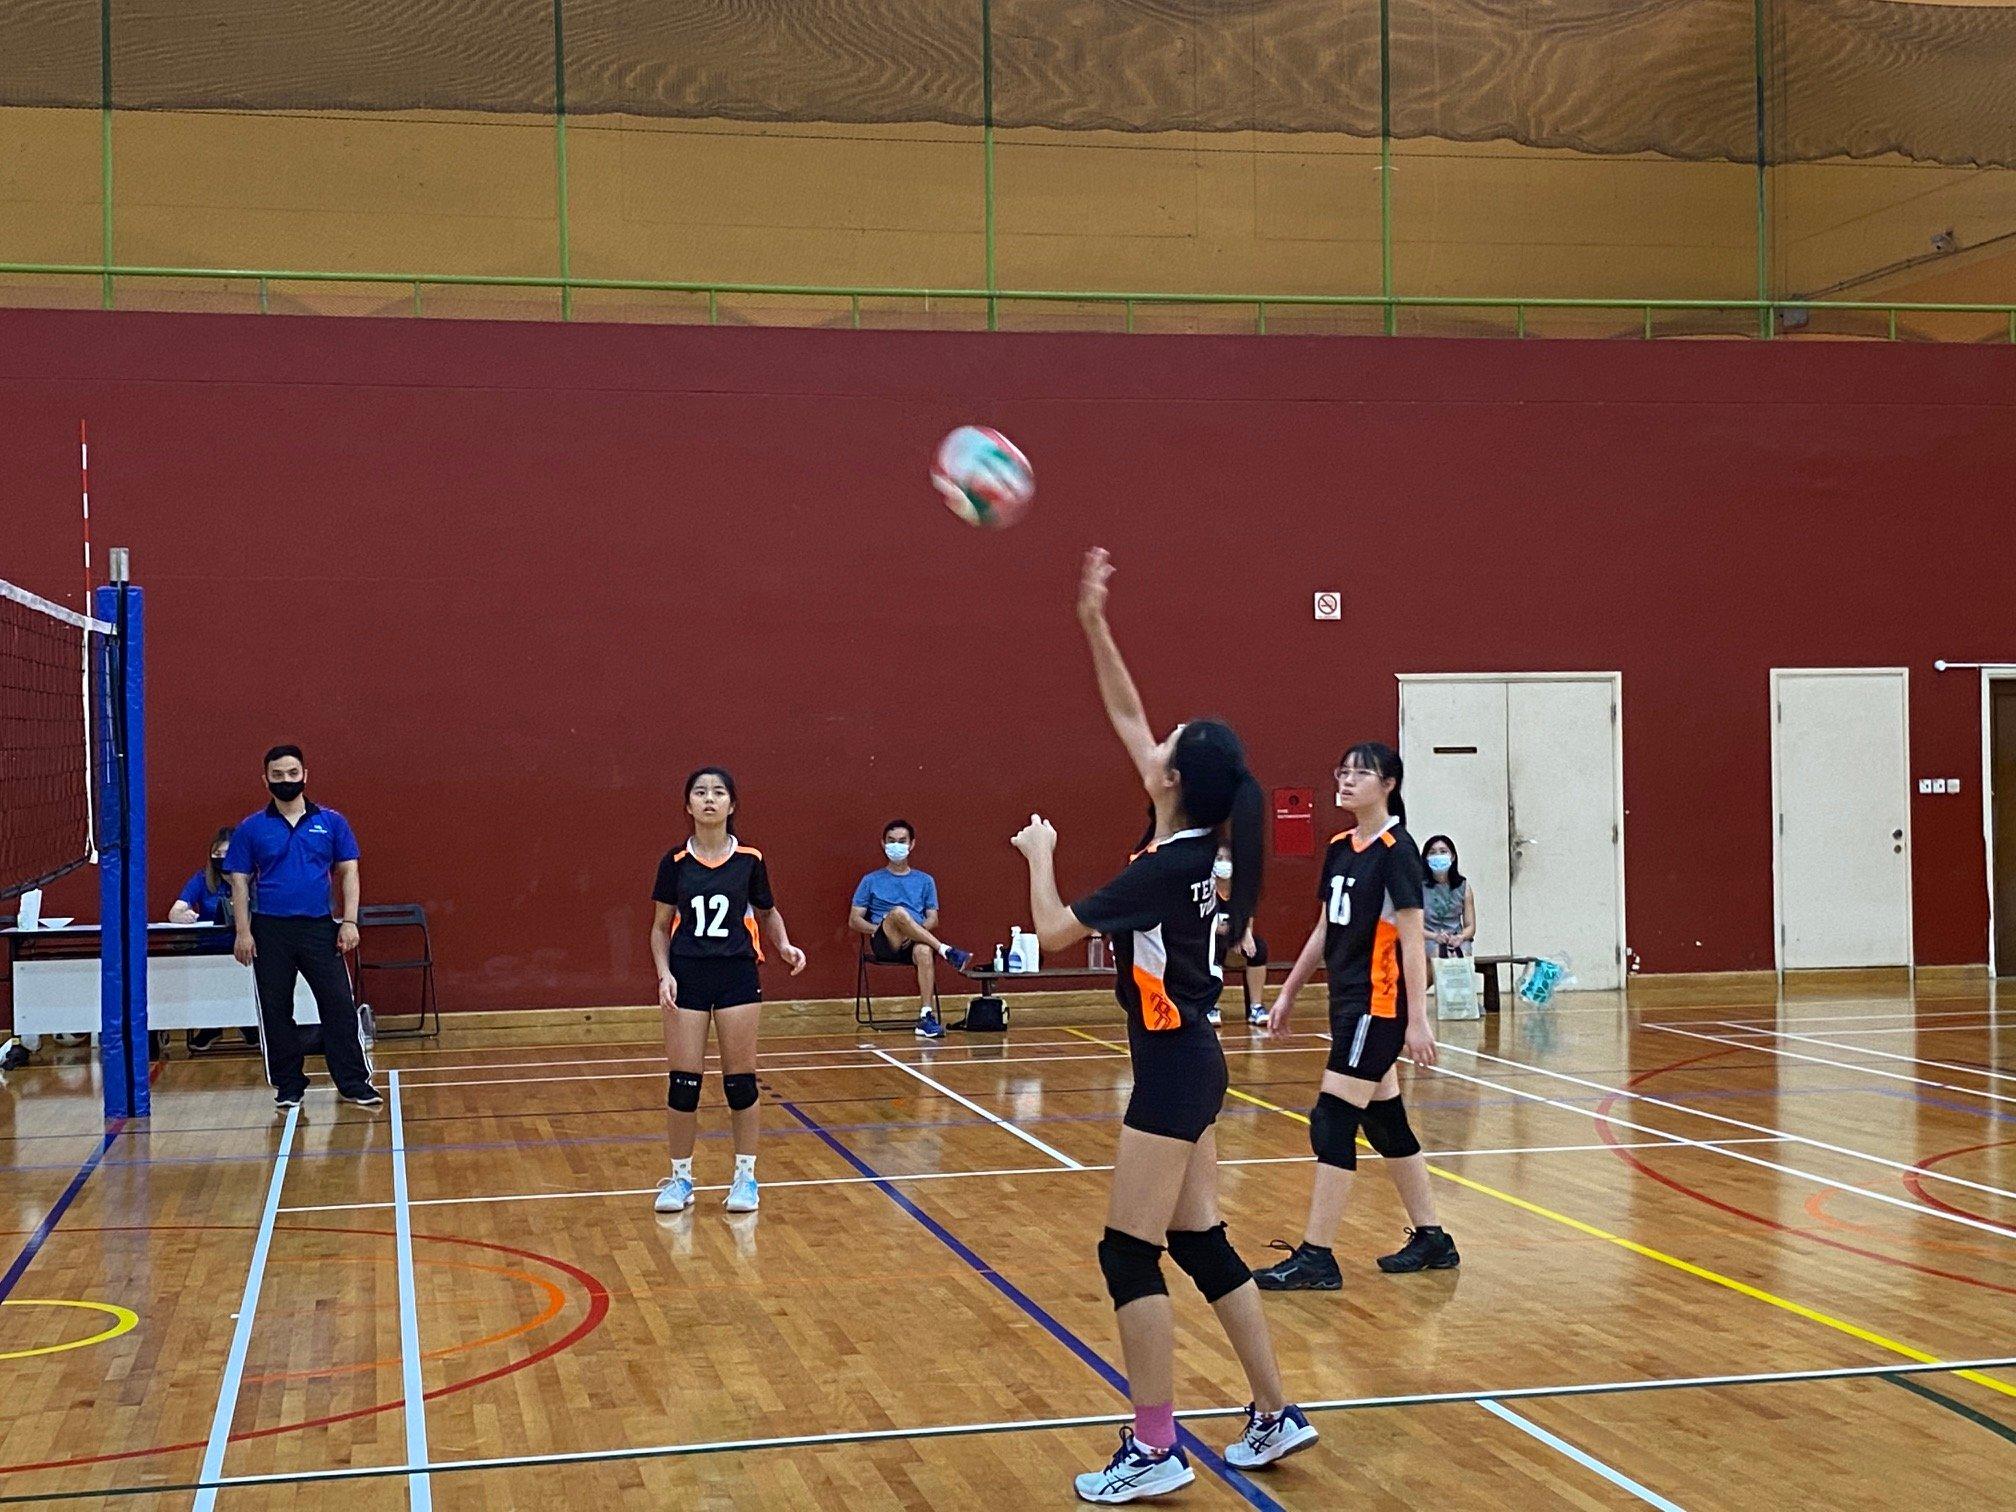 NSG A Div girls' volleyball prelim rd - ACJC (red) vs TJC (black) 2